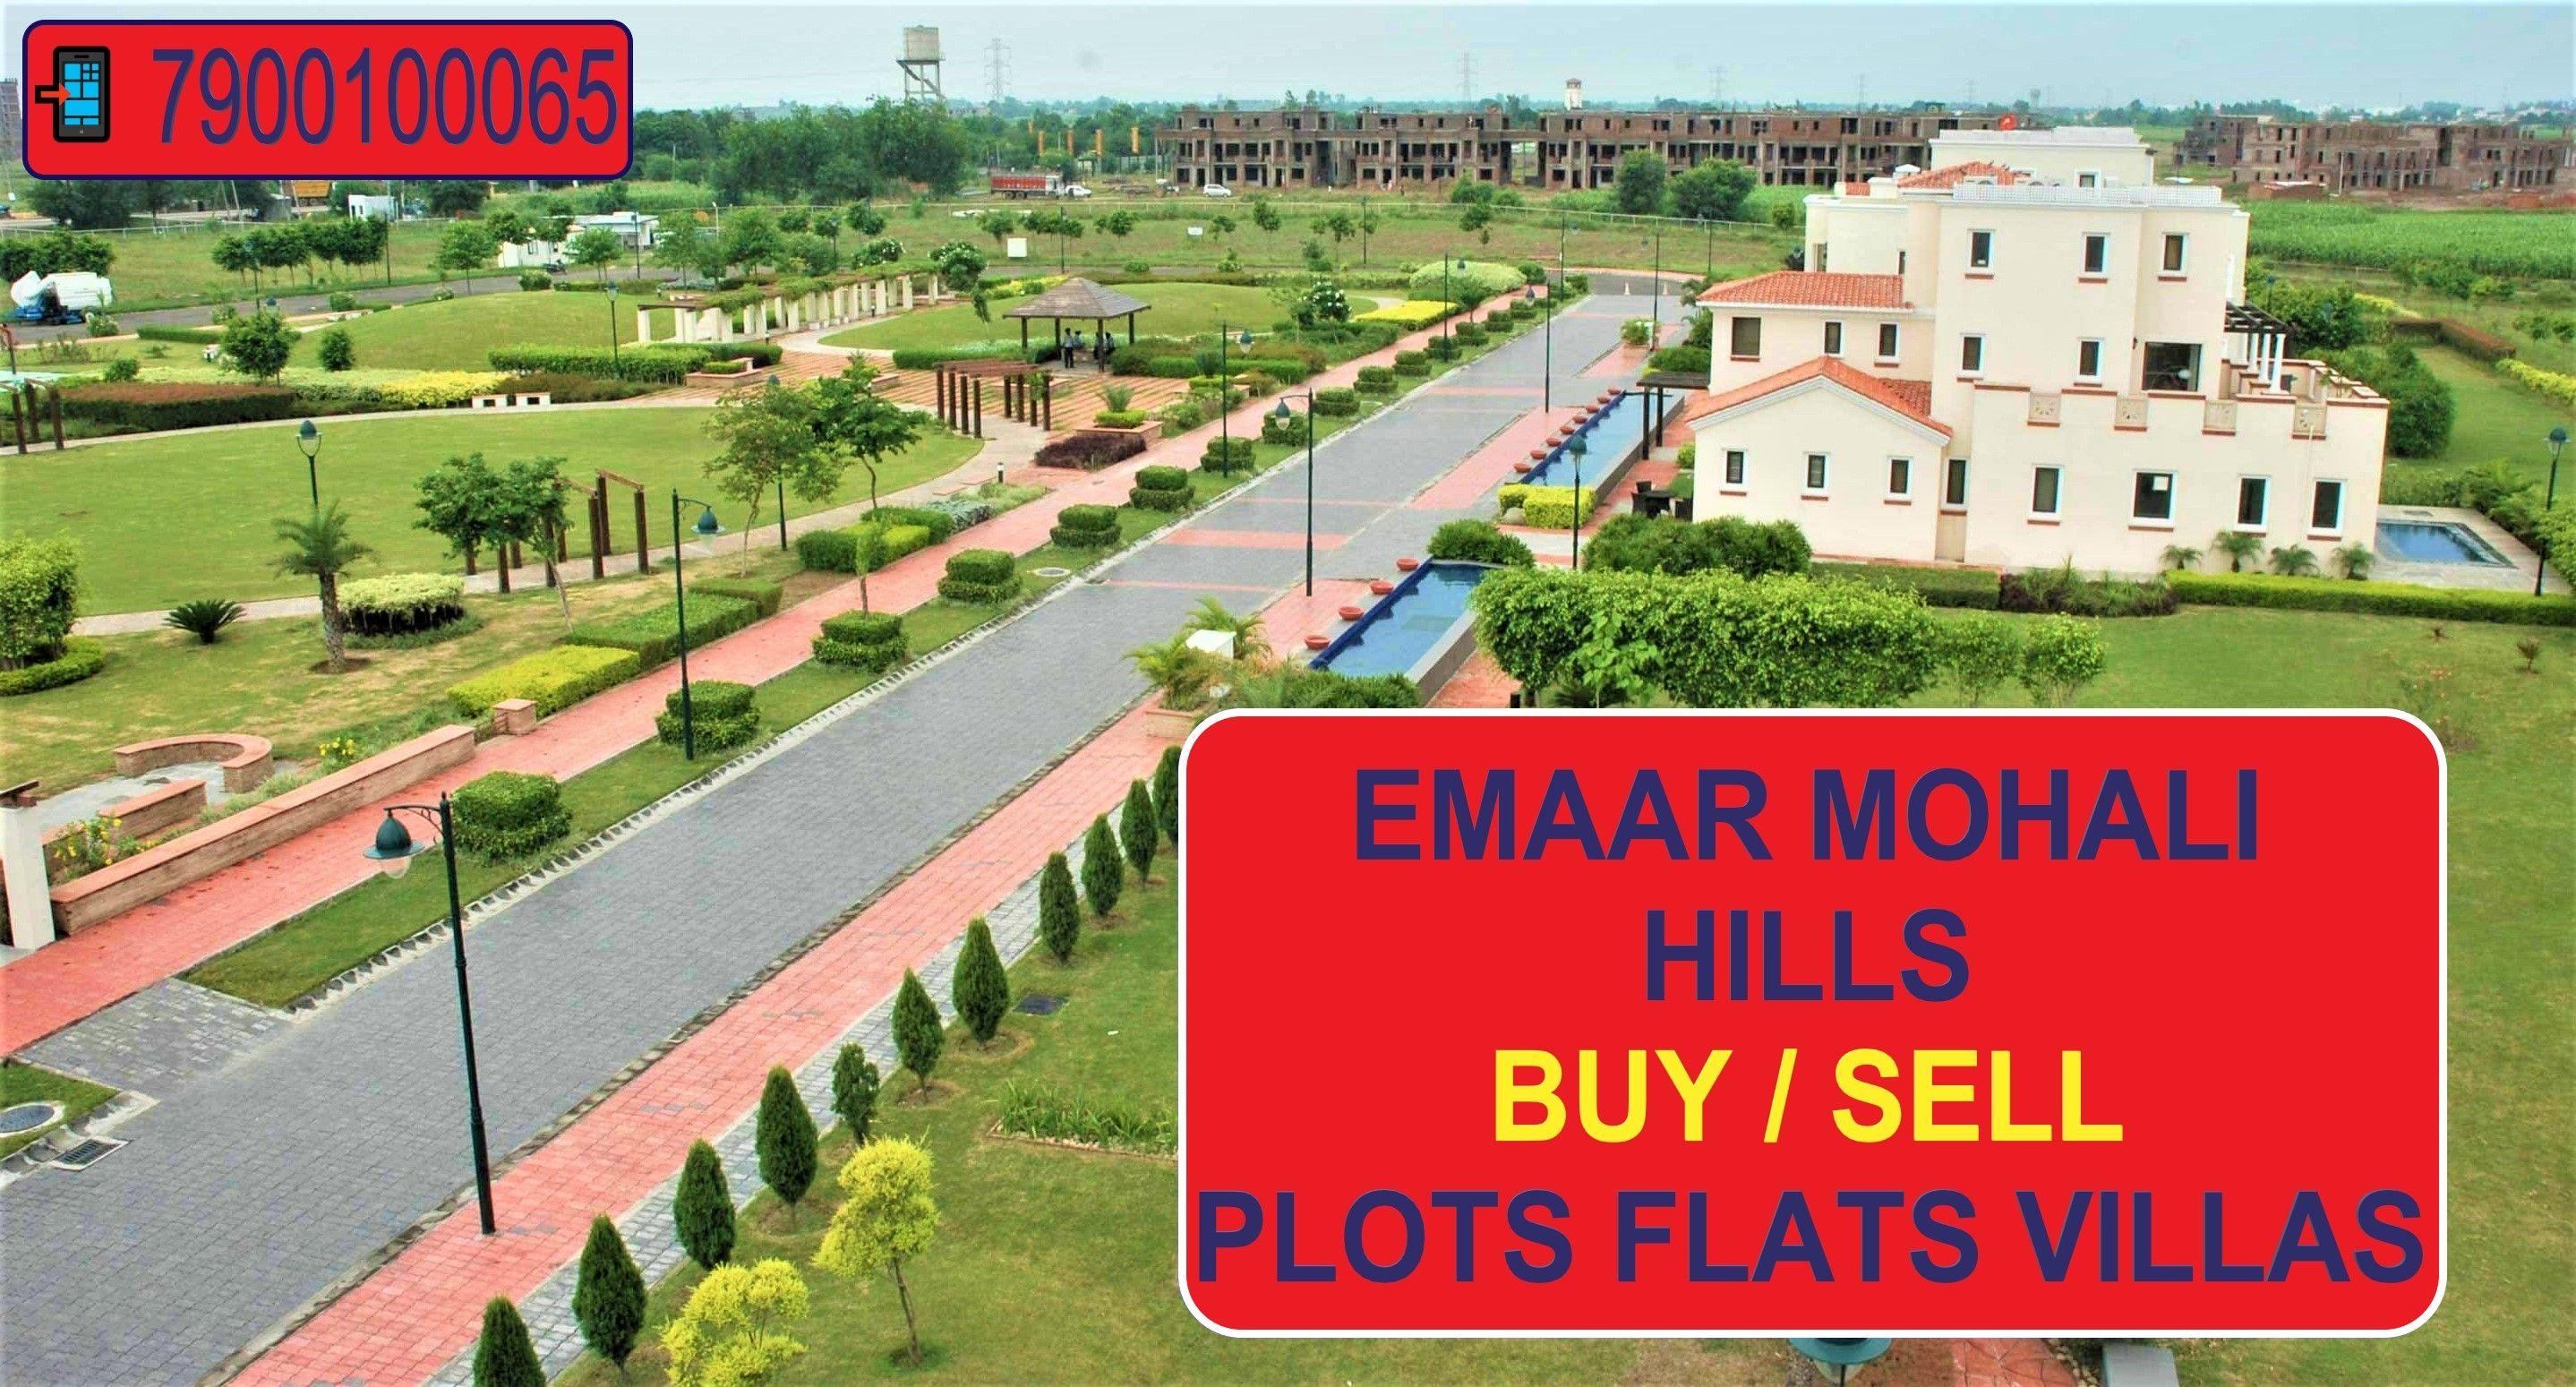 EMAAR MOHALI HILLS House styles, Villa, Hills